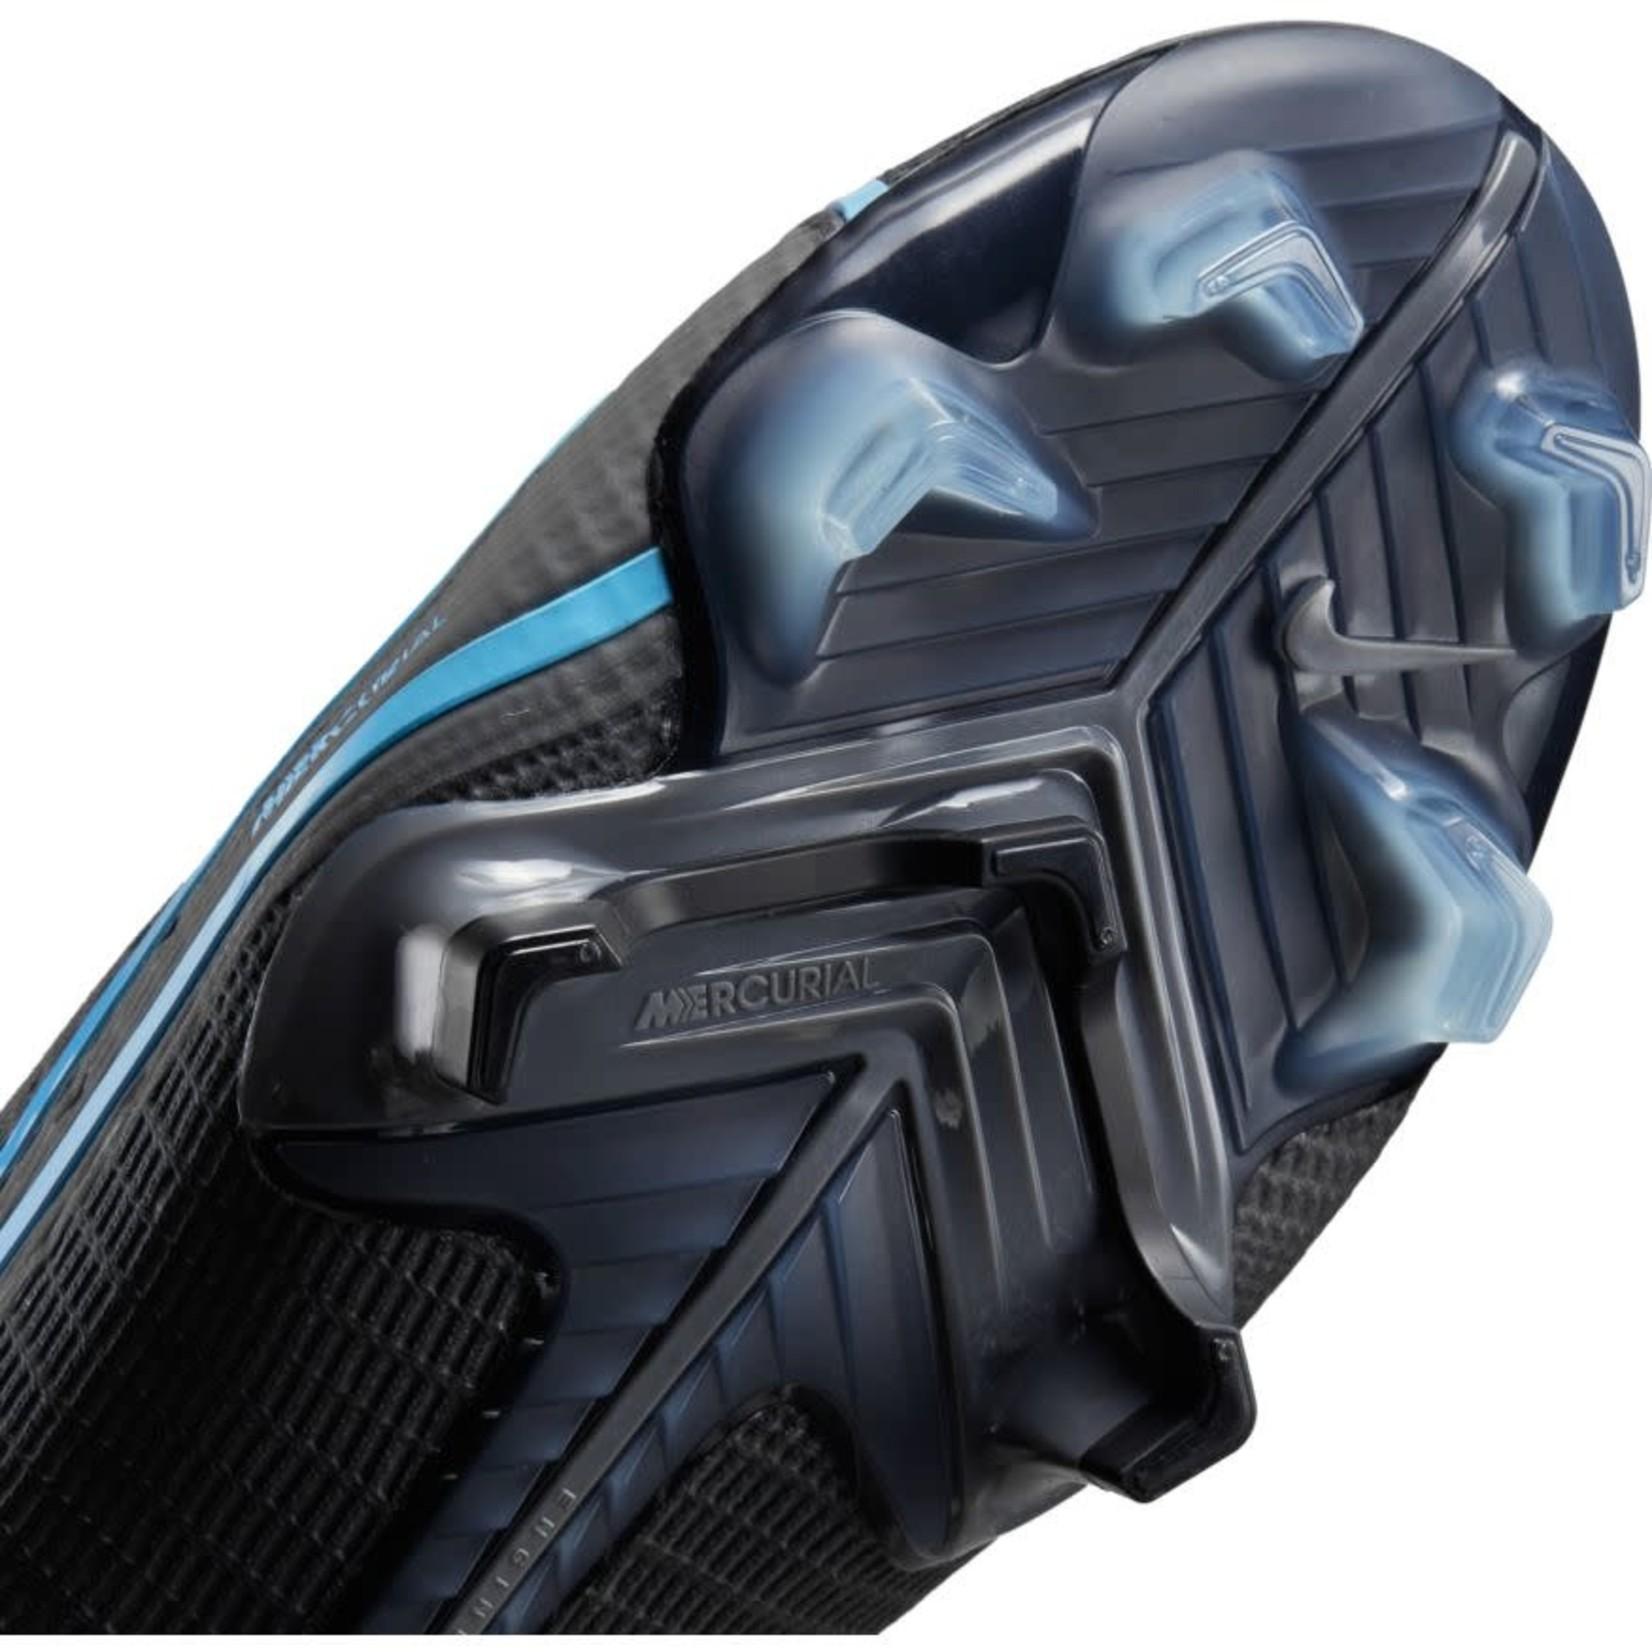 NIKE MERCURIAL VAPOR 14 ELITE FG (BLACK/BLUE)